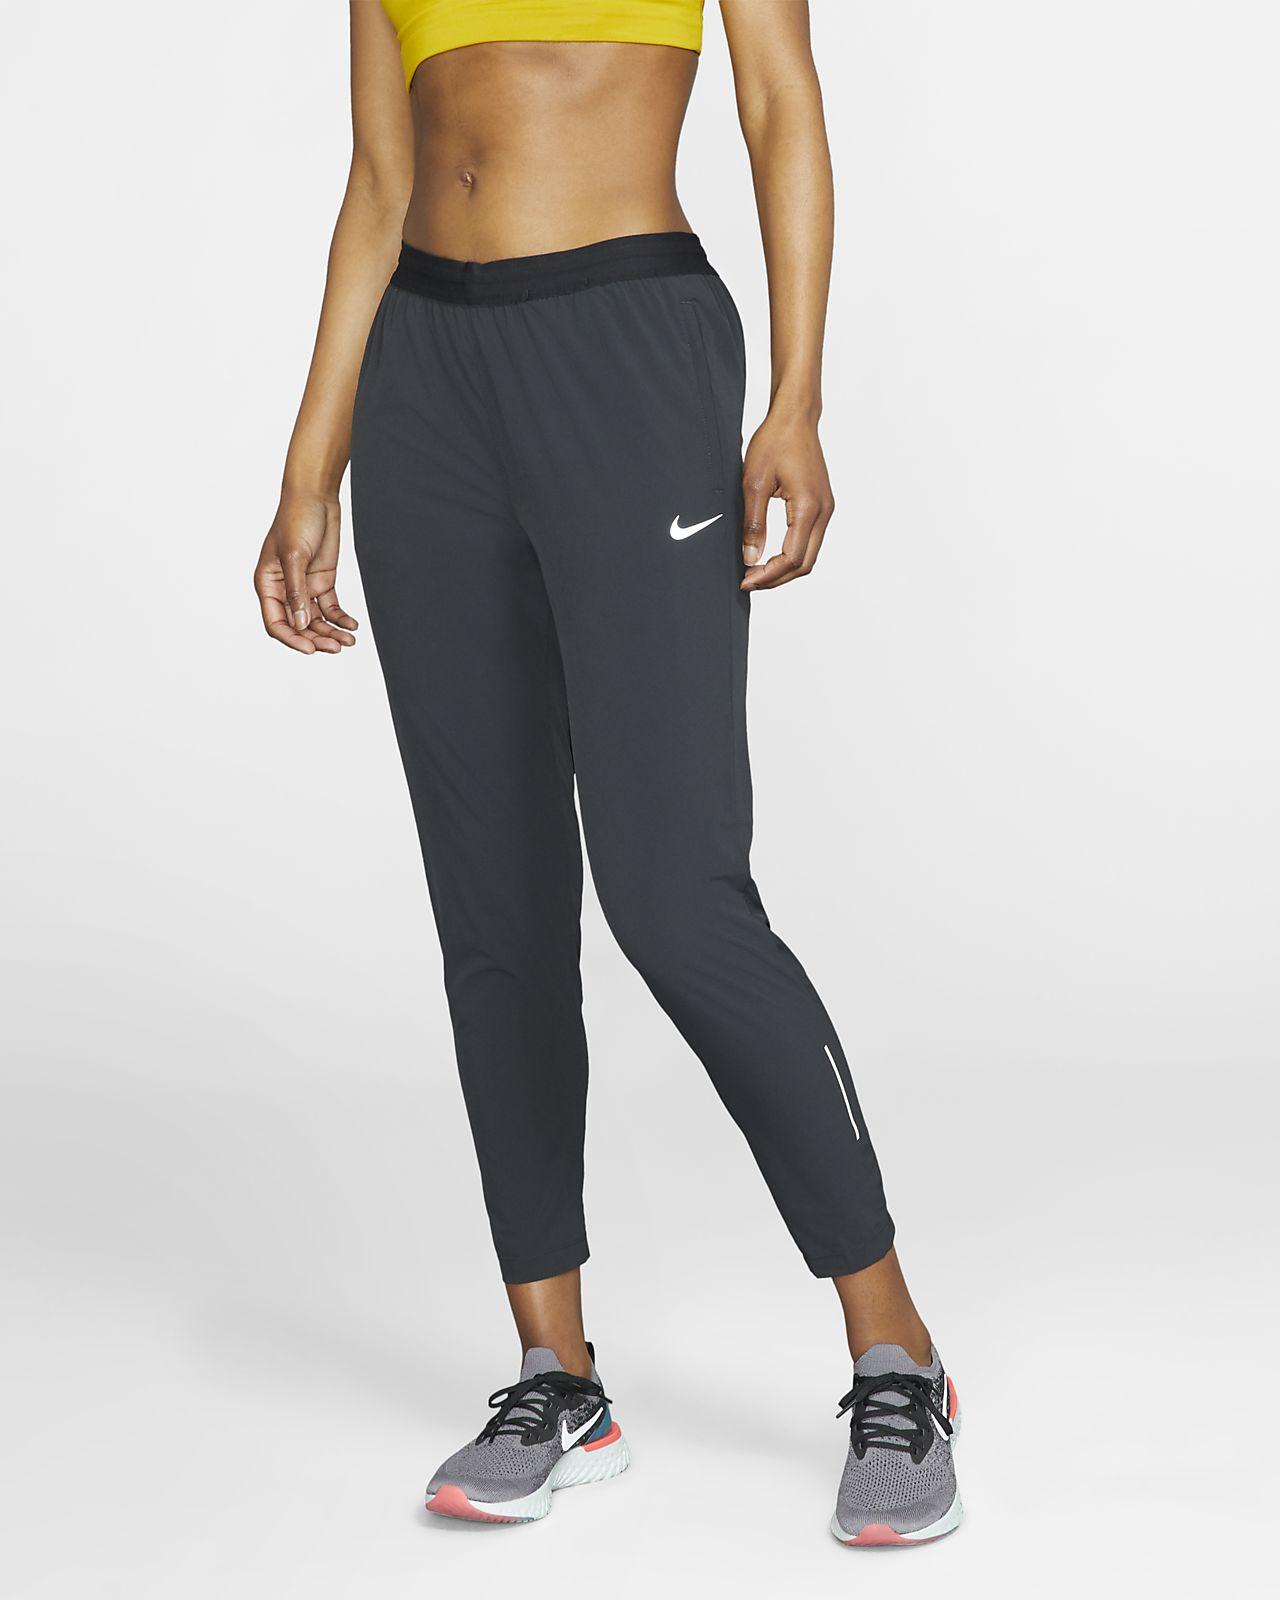 Pantaloni da running 7/8 Nike Essential - Donna